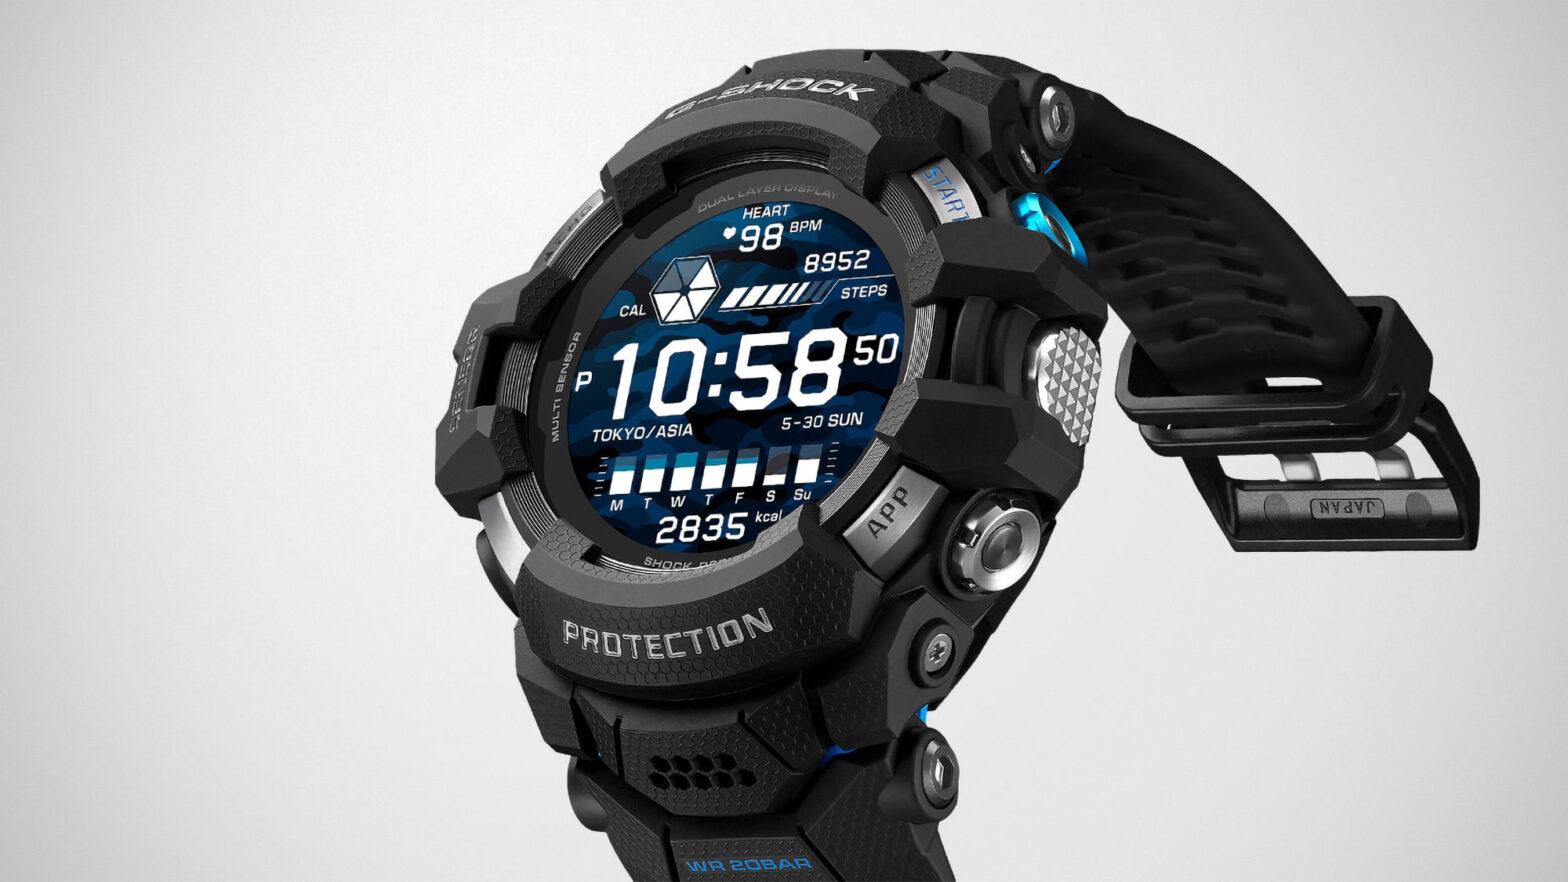 G-Shock GSW-H1000 G-Squad Pro Smartwatch